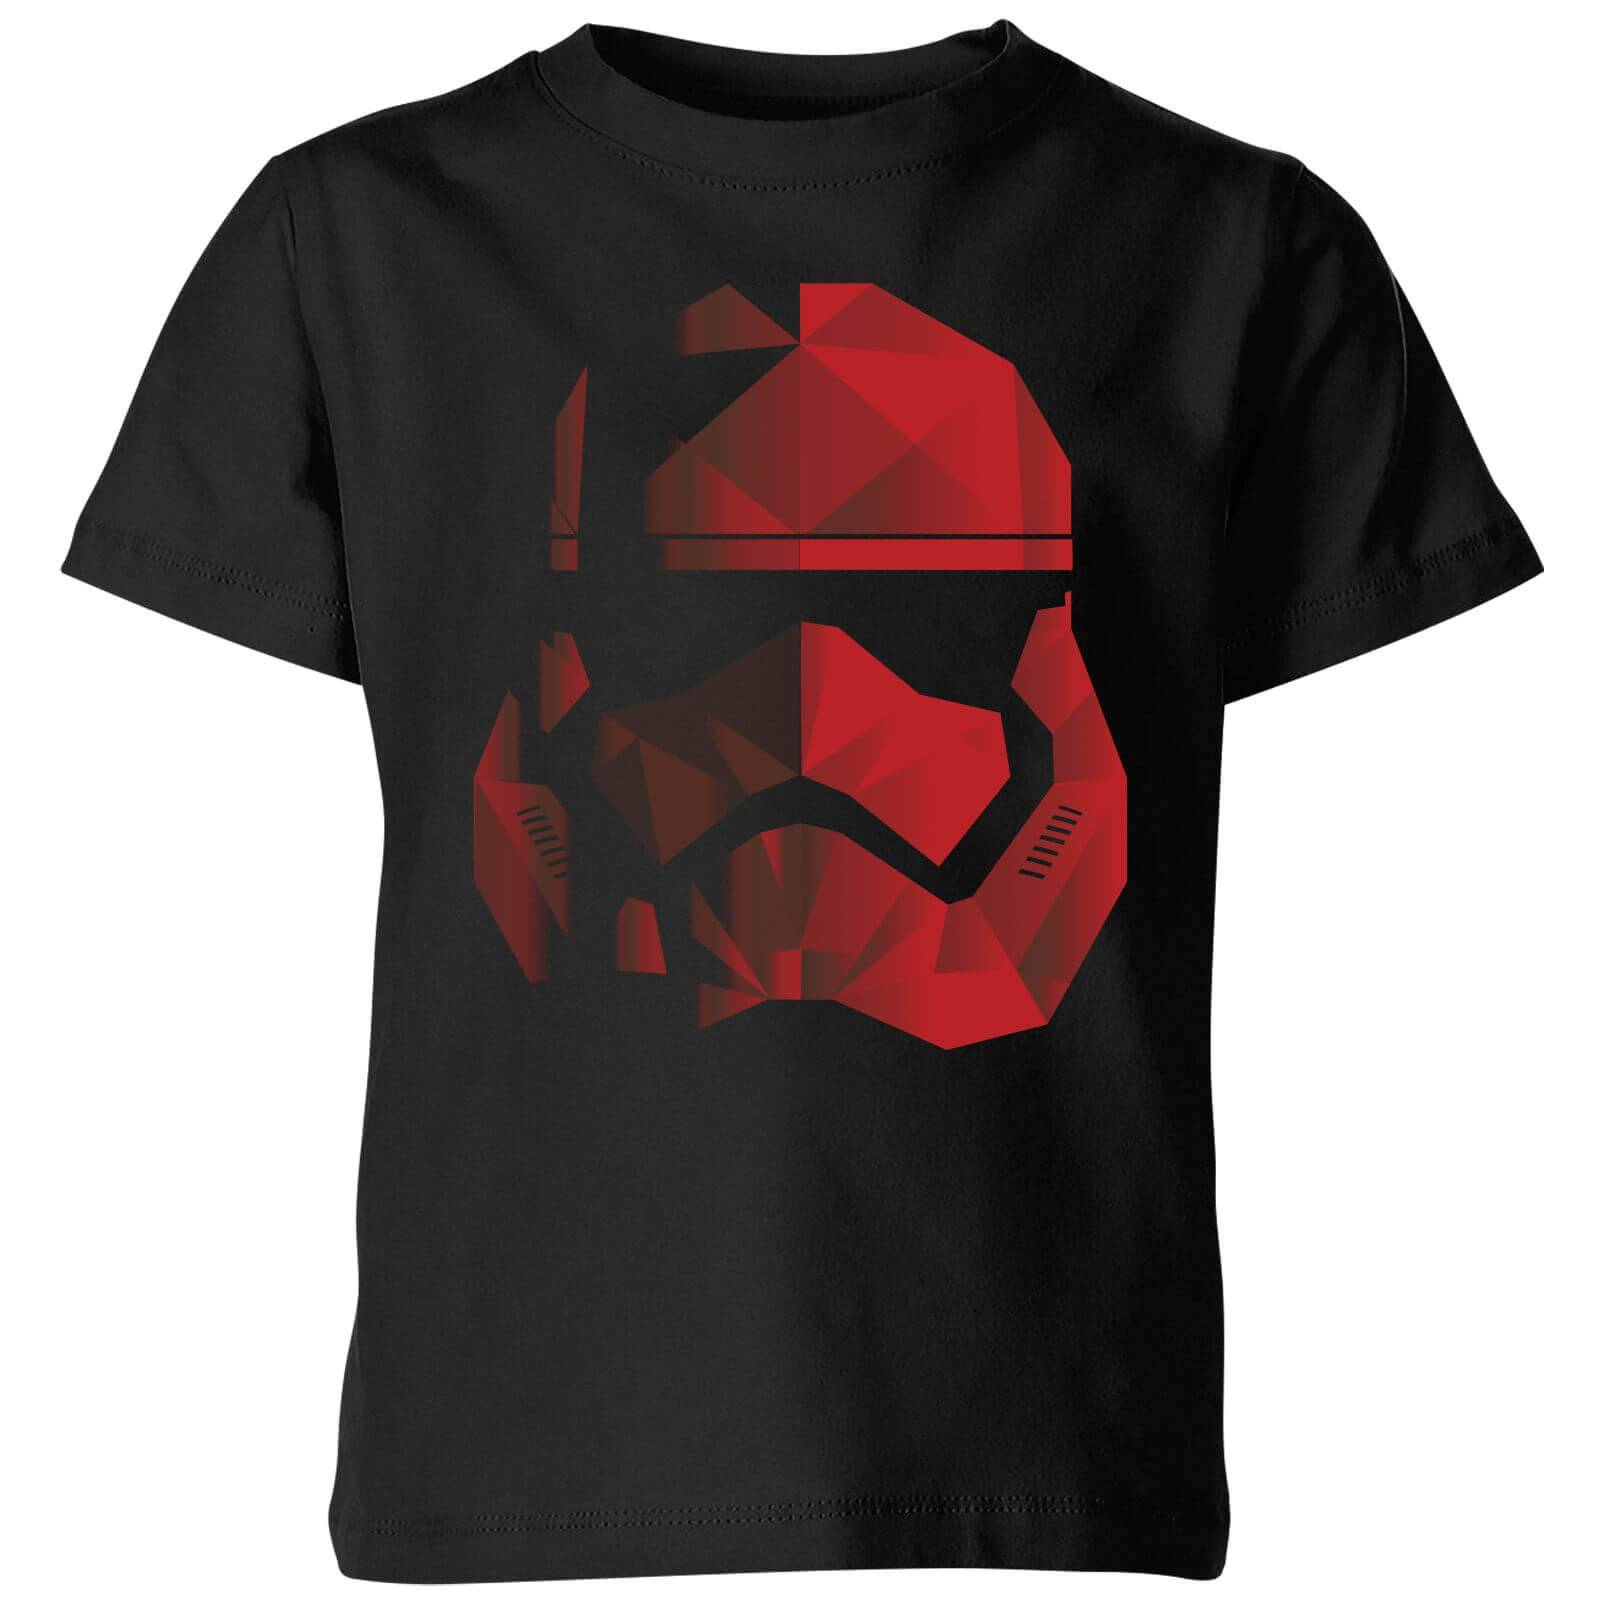 Star Wars T-Shirt Enfant Casque Stormtrooper Effet Cubiste - Star Wars - Noir - 9-10 ans - Noir